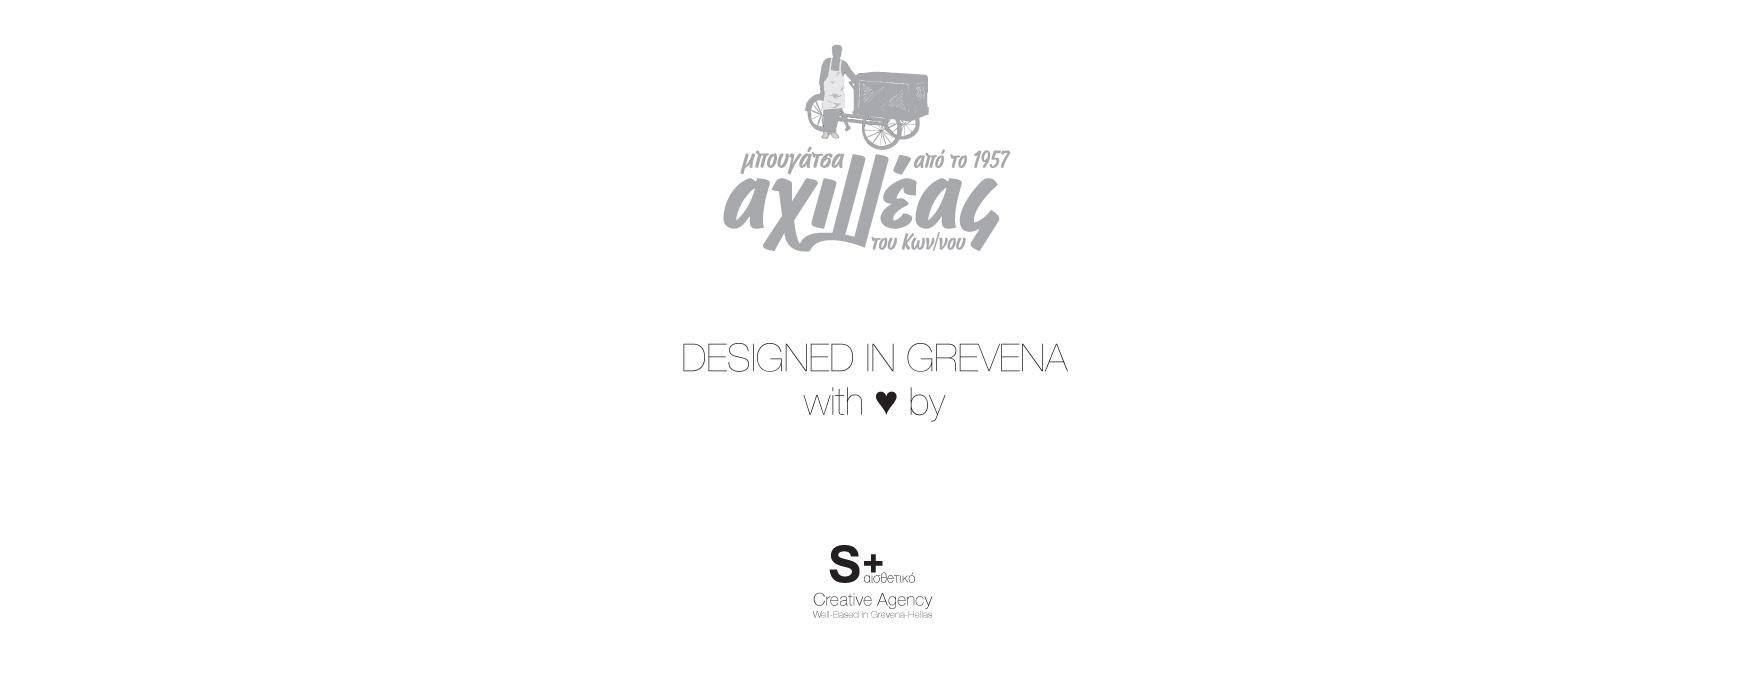 axilleas_logo_designed